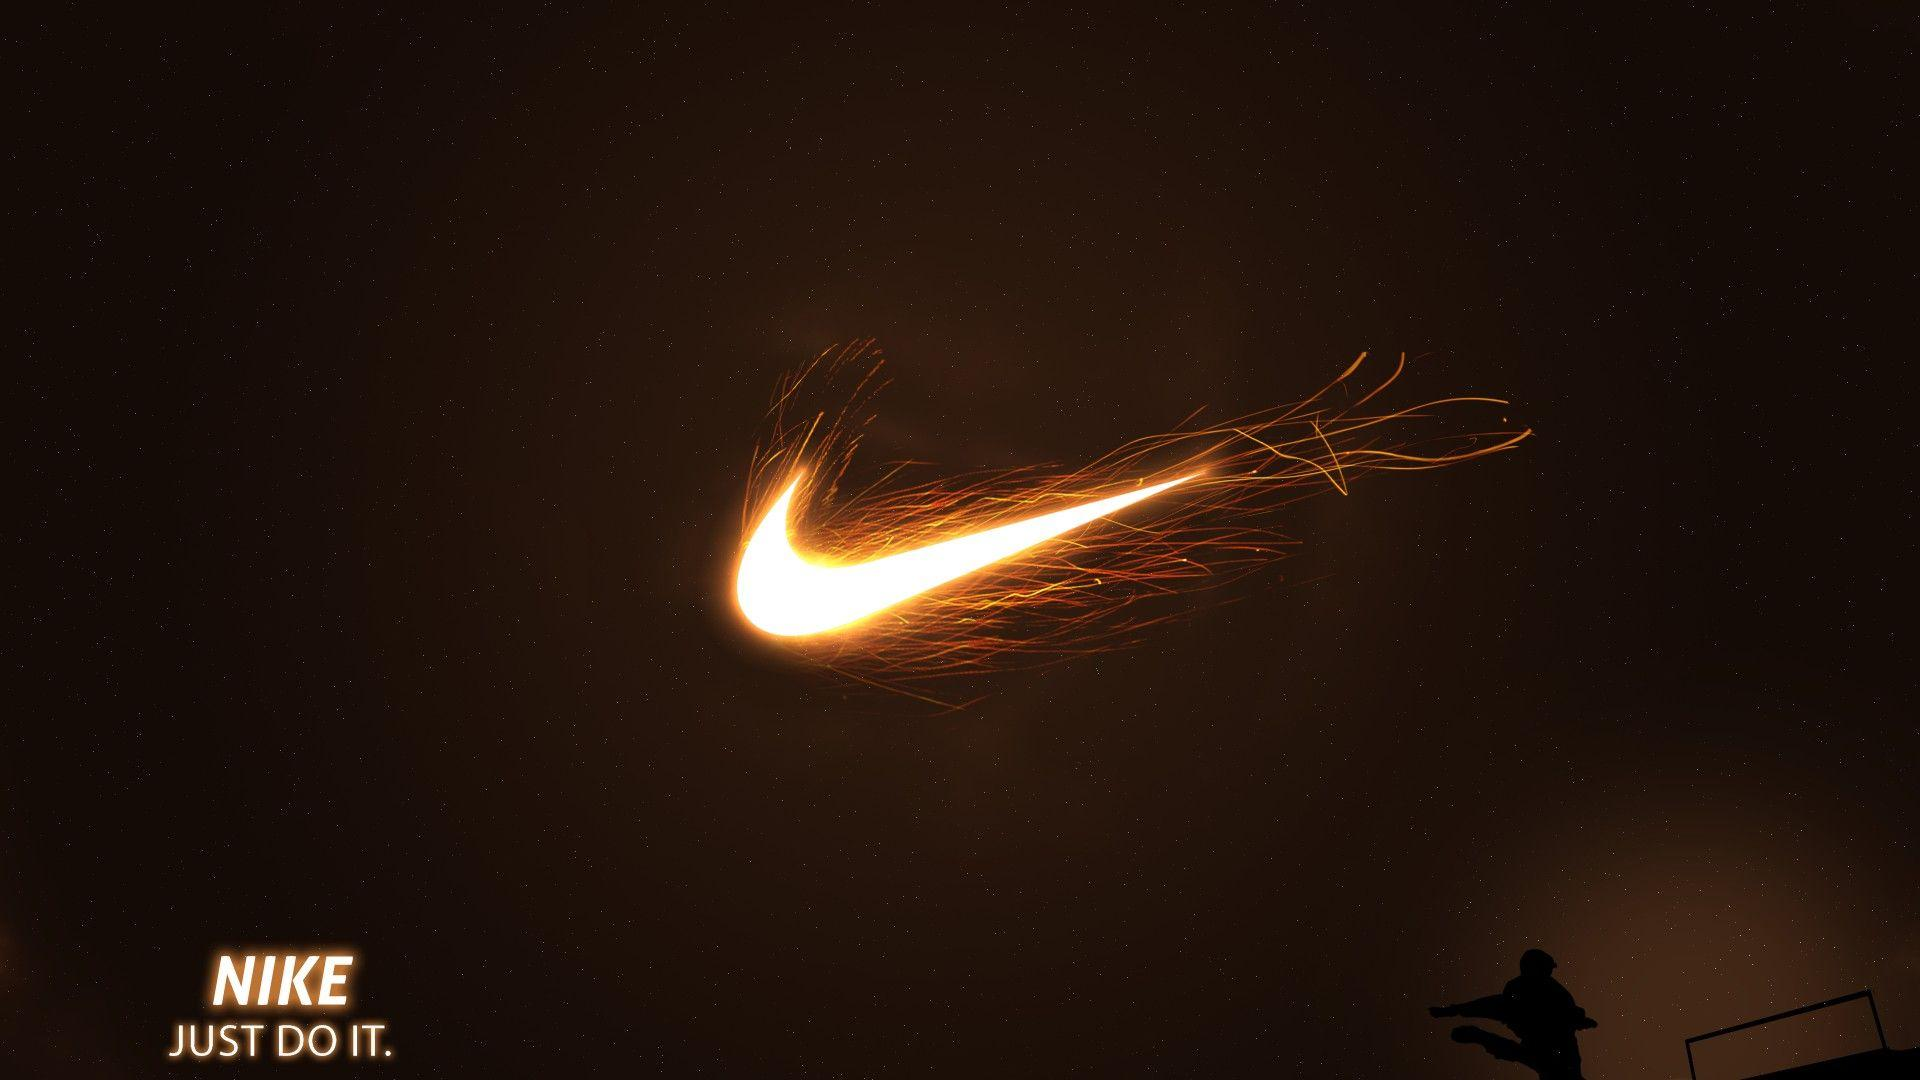 Nike Logo Wallpapers HD 2016